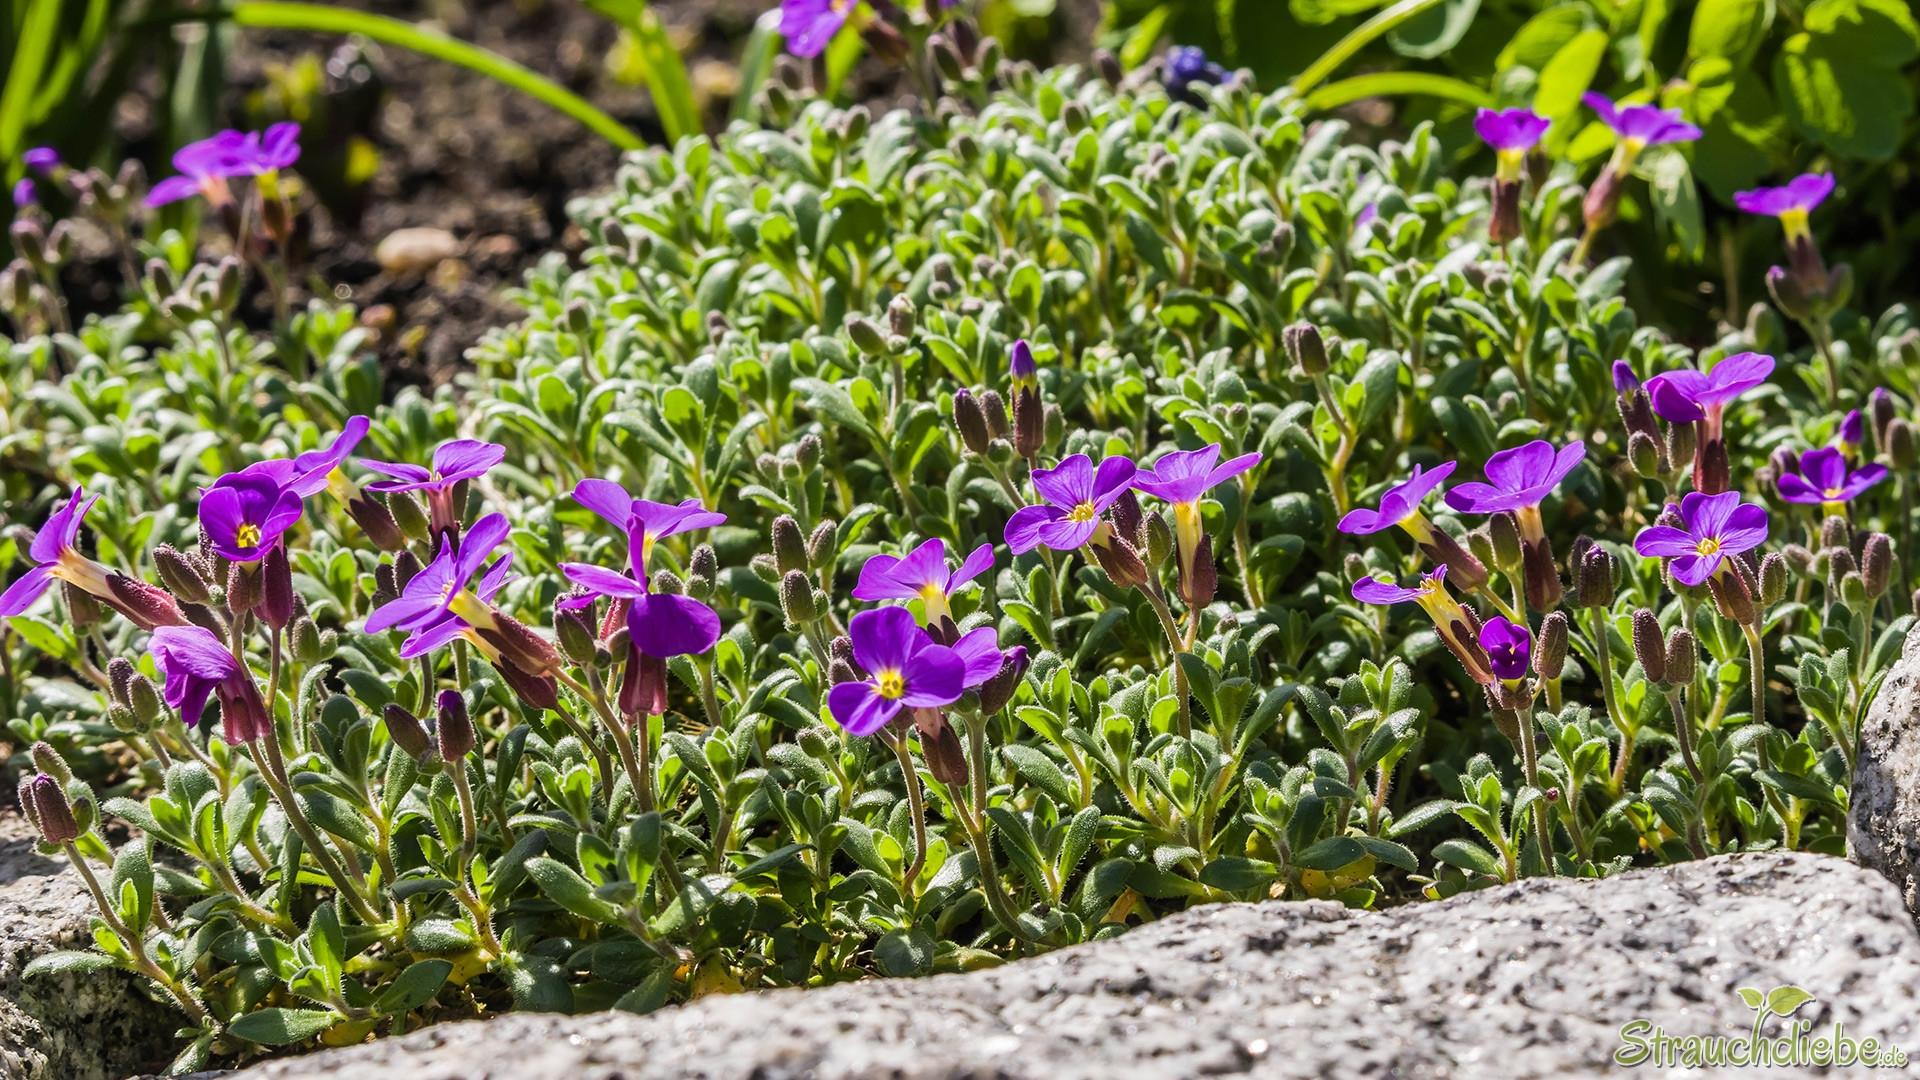 Violettes Blaukissen (Aubrieta)